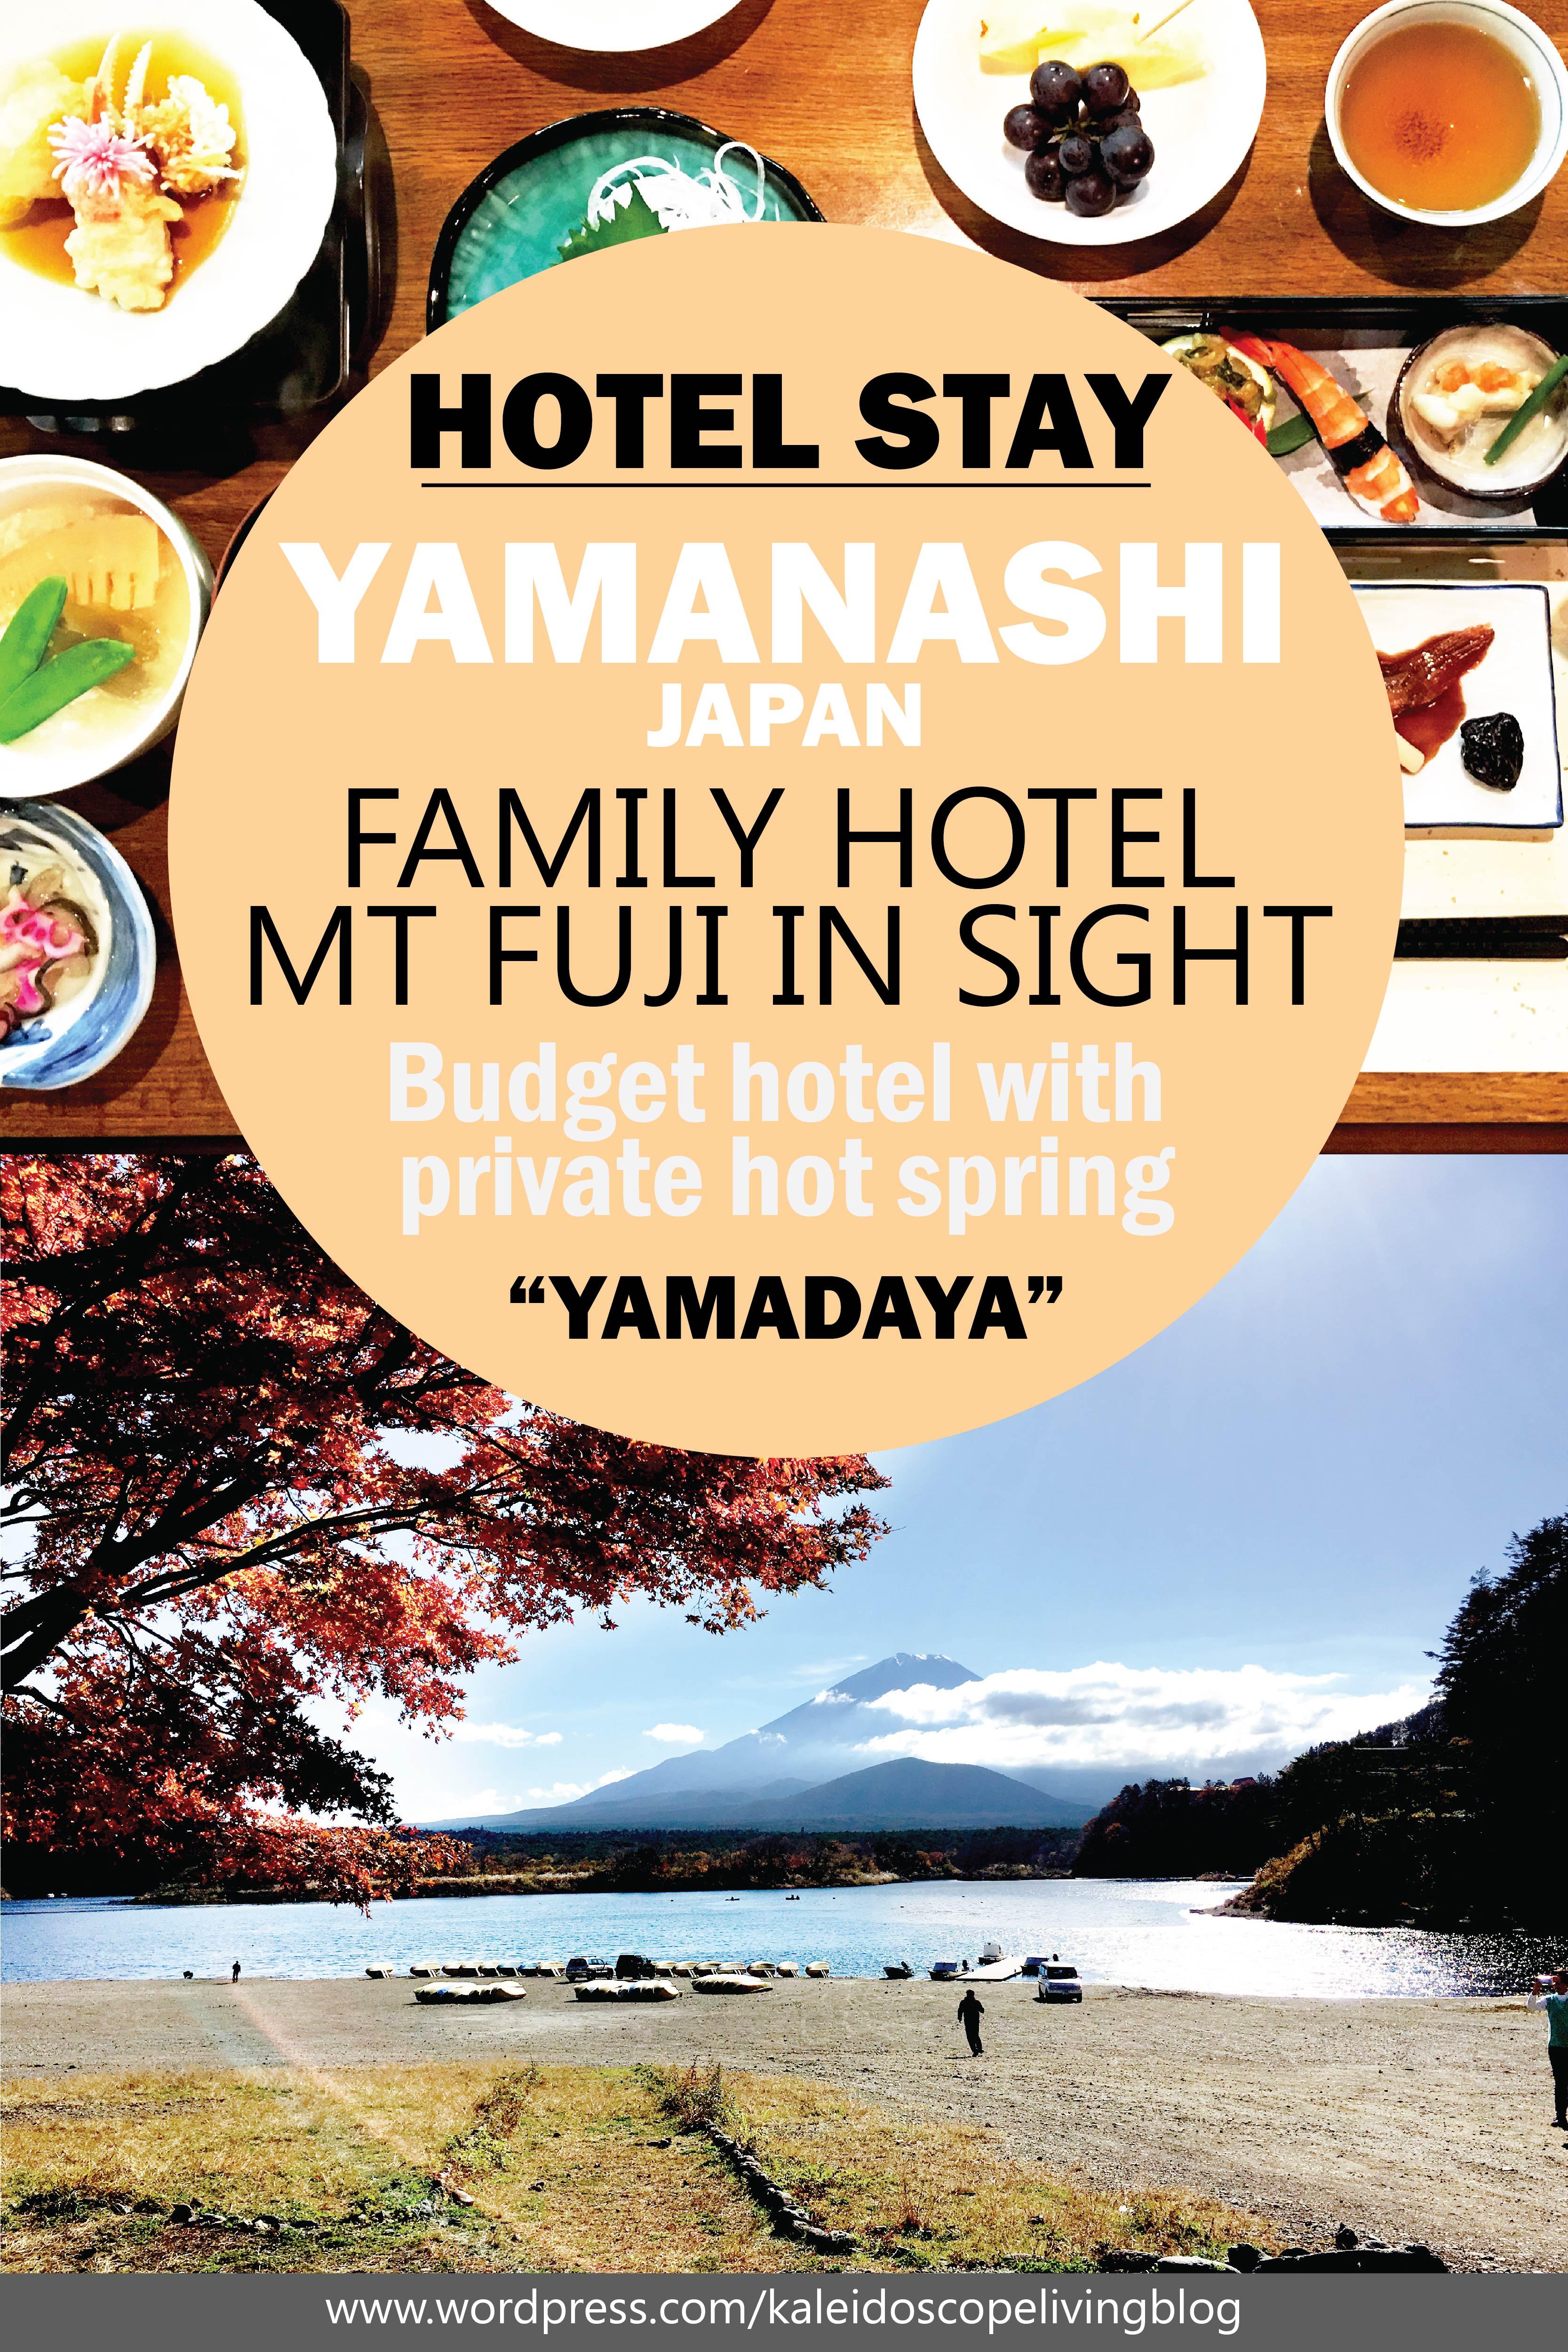 Mount Fuji Yamadaya Hotel Review Japan Tokyo Yamanashi Travel COVER